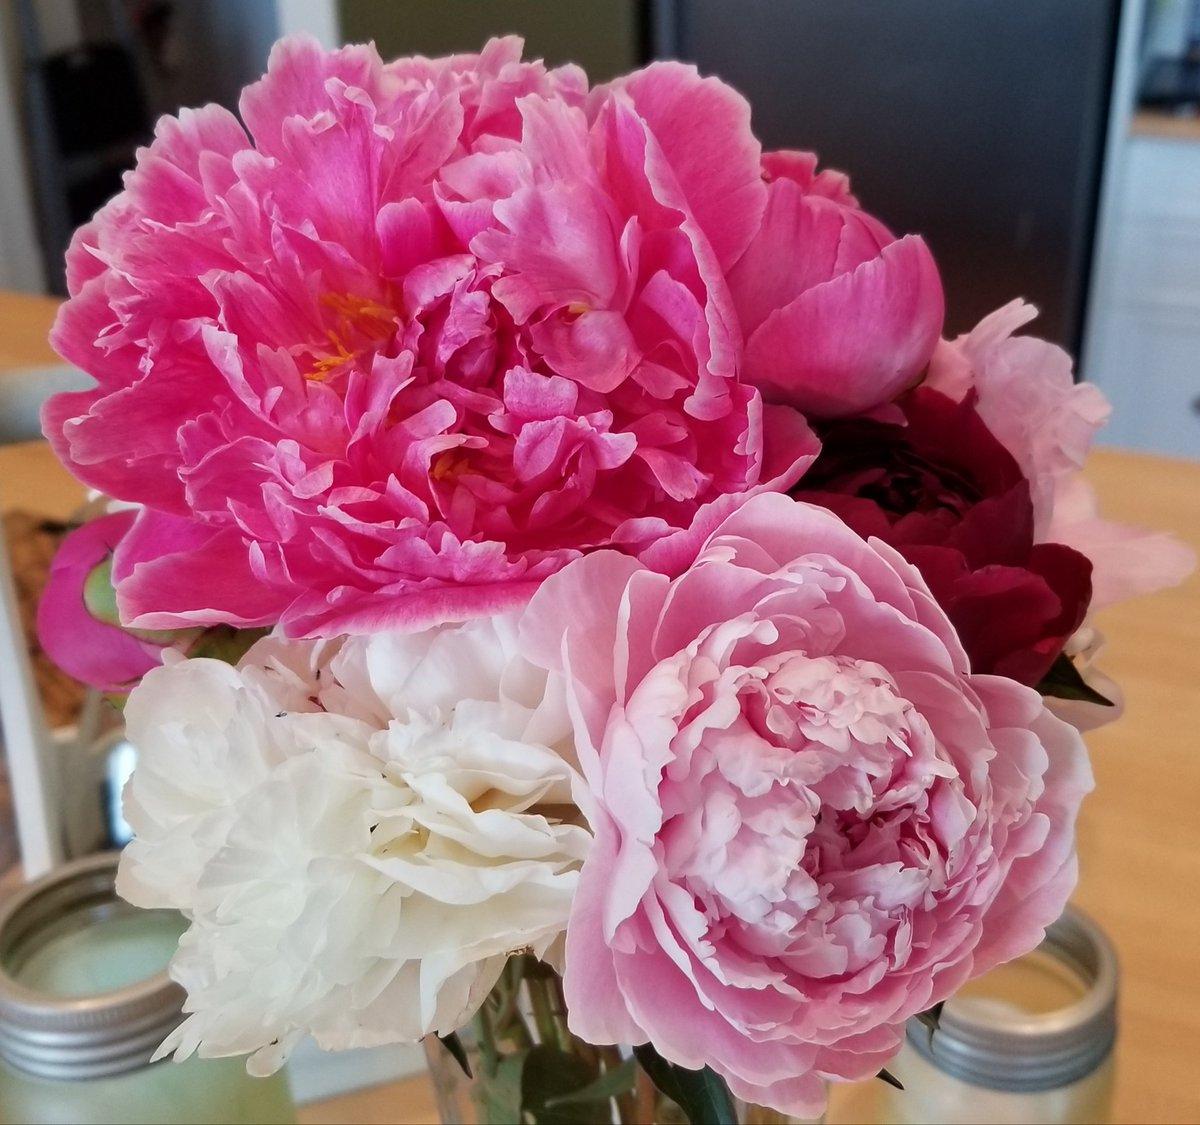 LOVE peony season!!! #gardening https://t.co/hfGCHSdmMu